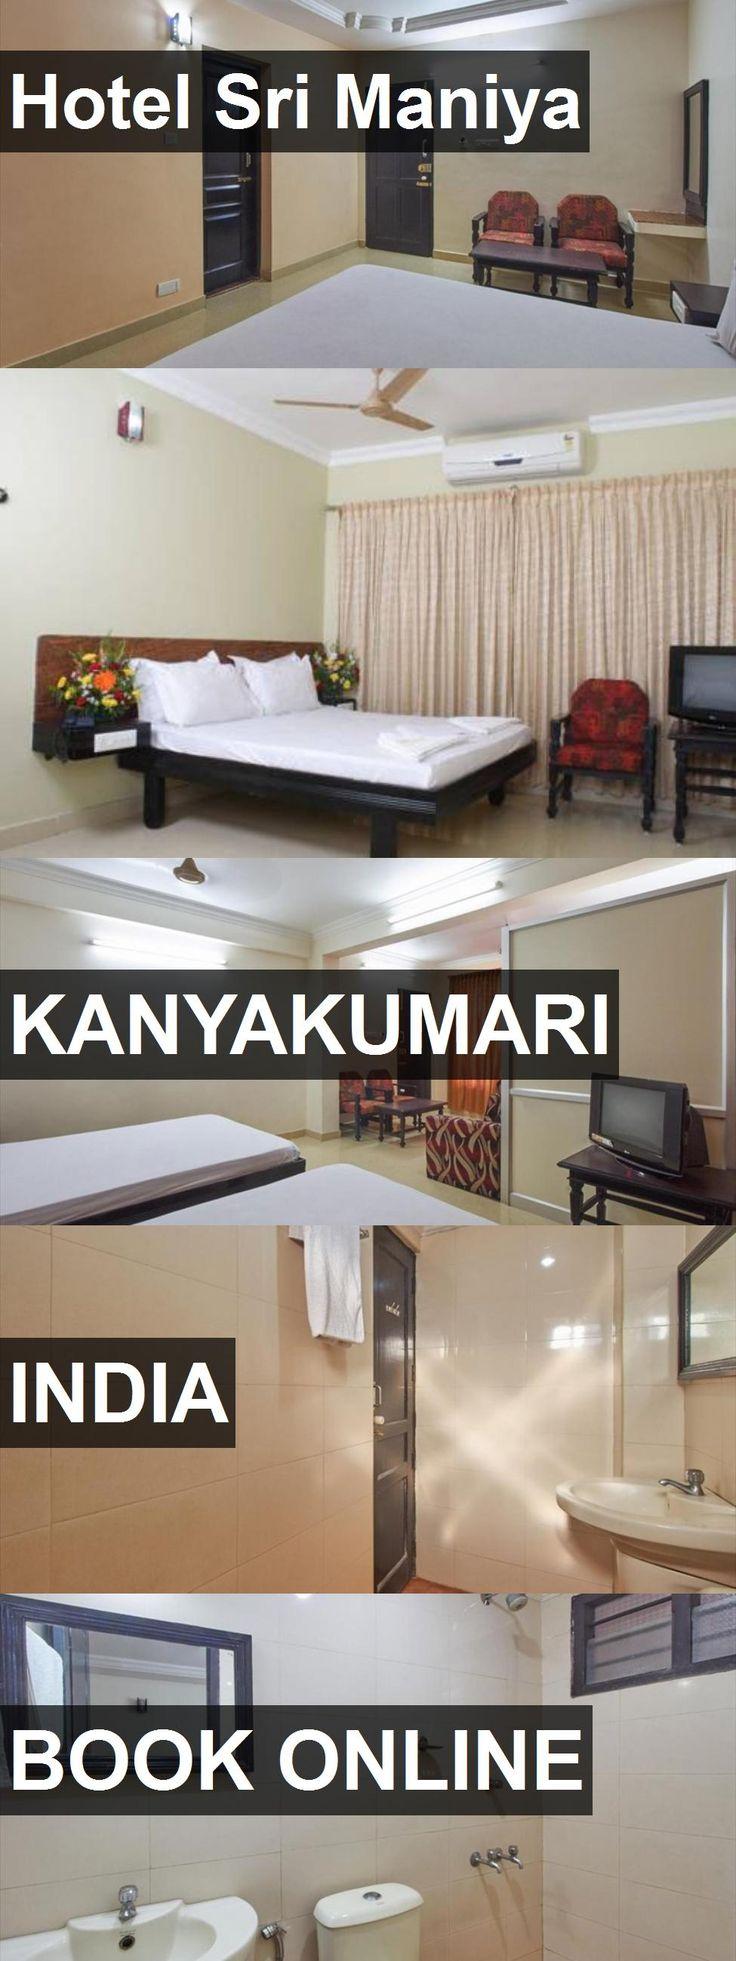 Hotel Sri Maniya in Kanyakumari, India. For more information, photos, reviews and best prices please follow the link. #India #Kanyakumari #travel #vacation #hotel